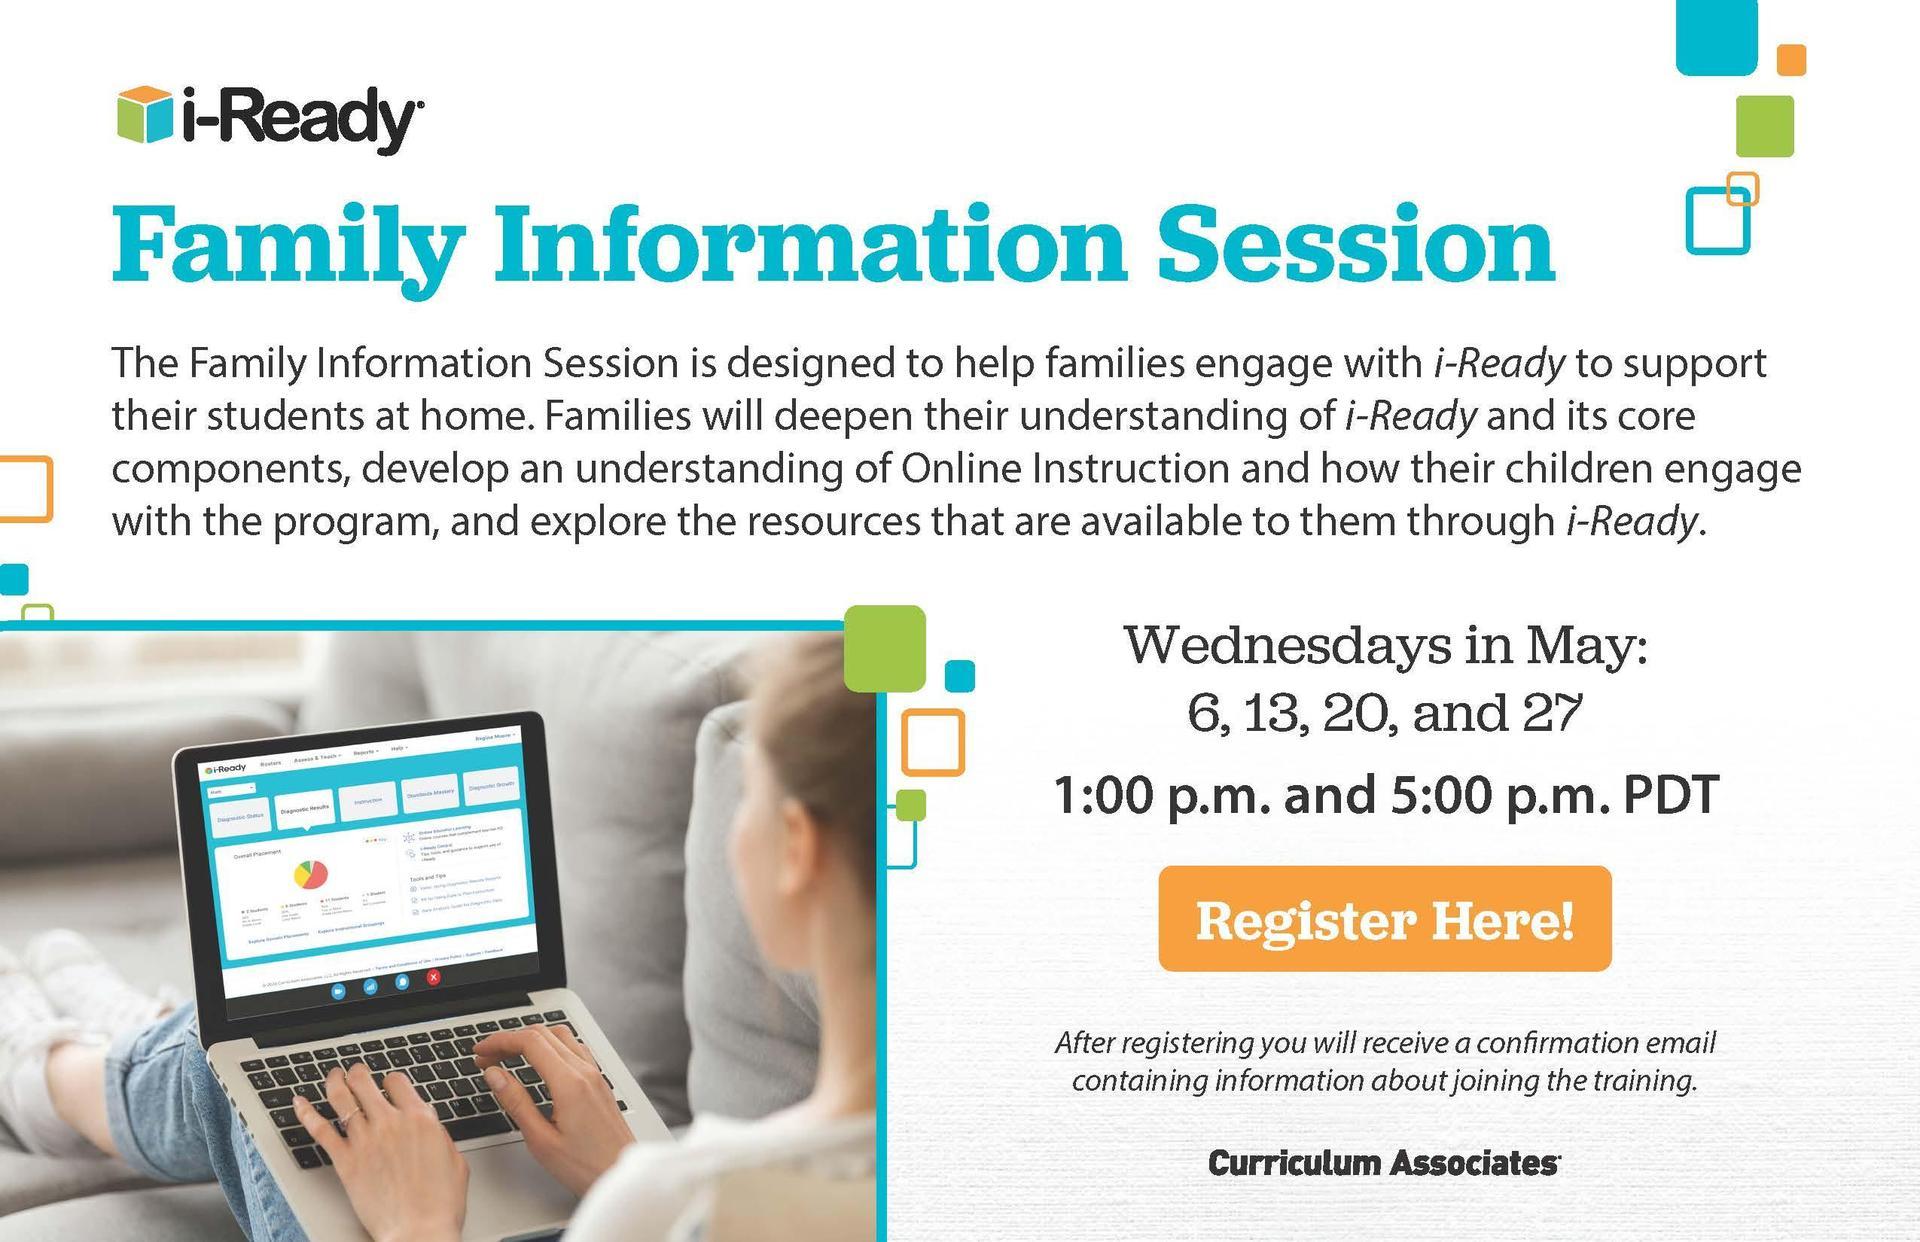 i-Ready Family Information Session